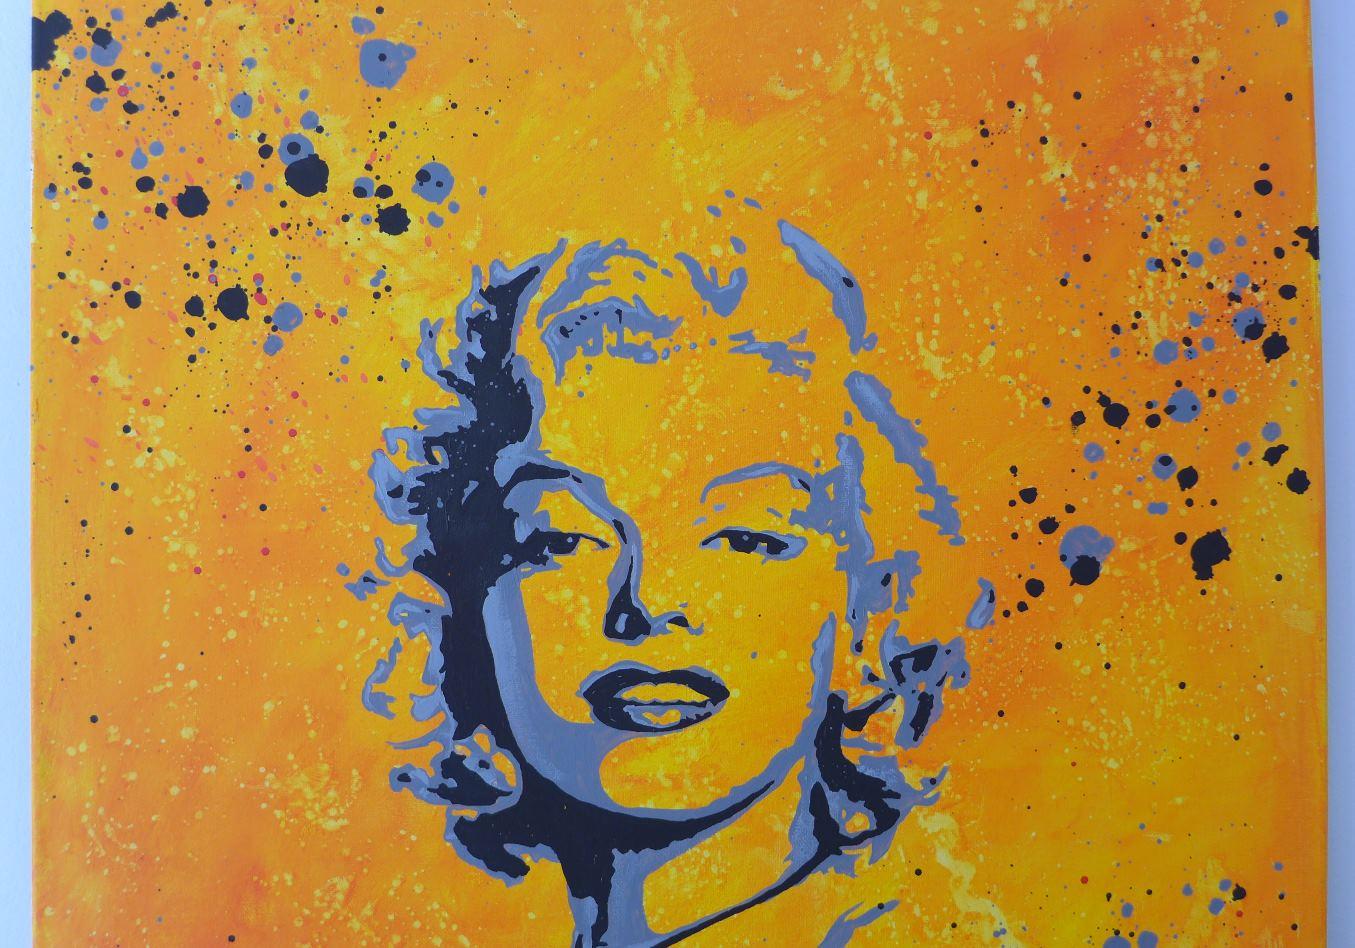 Tableau Street Art Marilyn Monroe Glamour - Slave 2.0